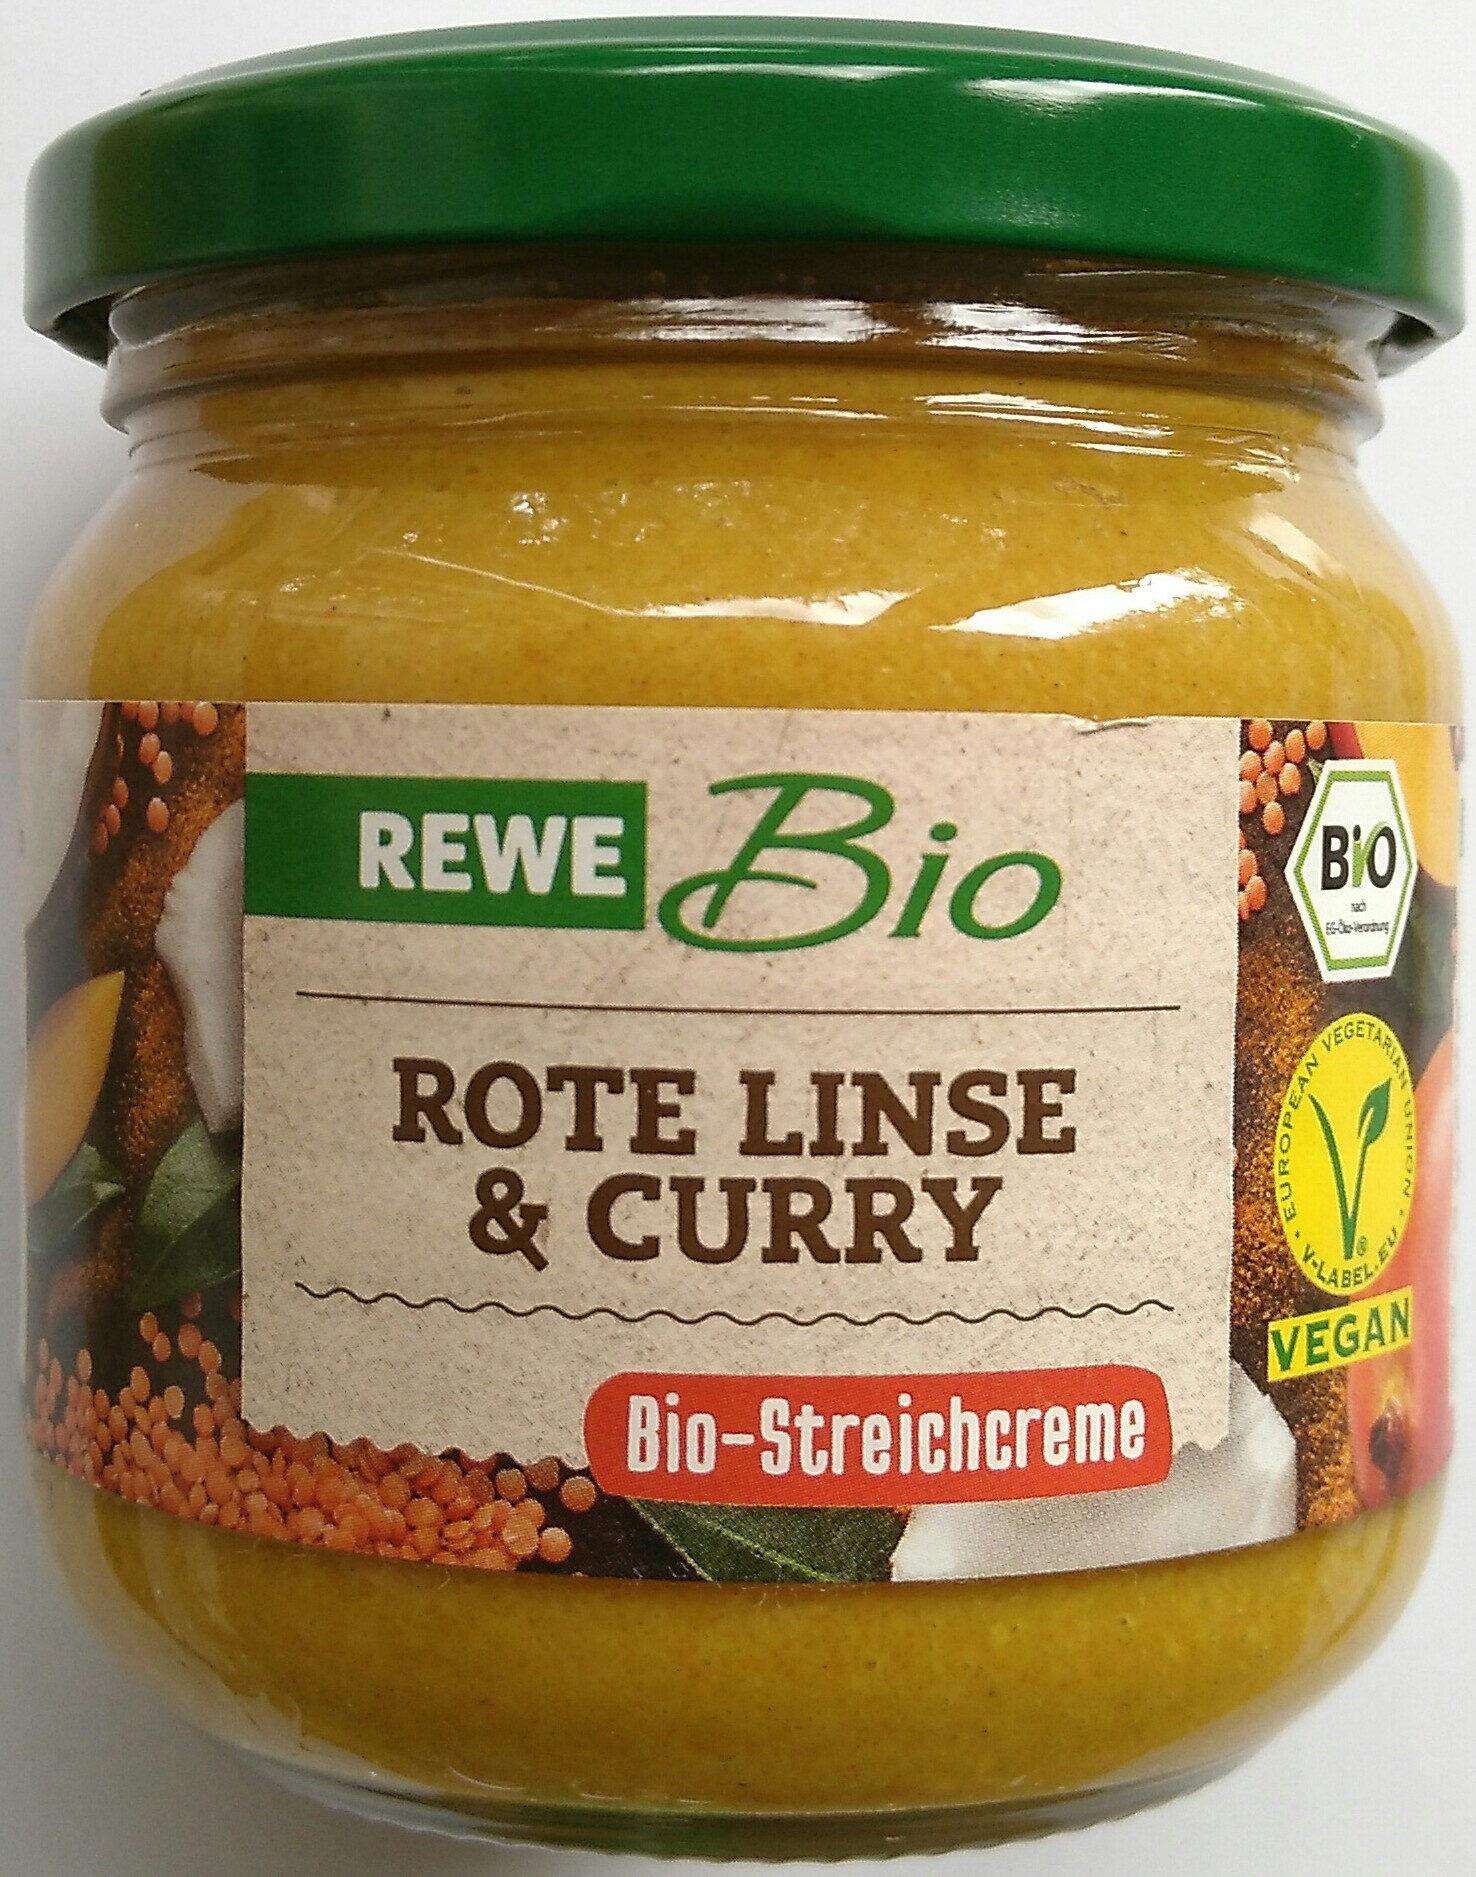 Bio-Streichcreme Rote Linse & Curry - Product - de